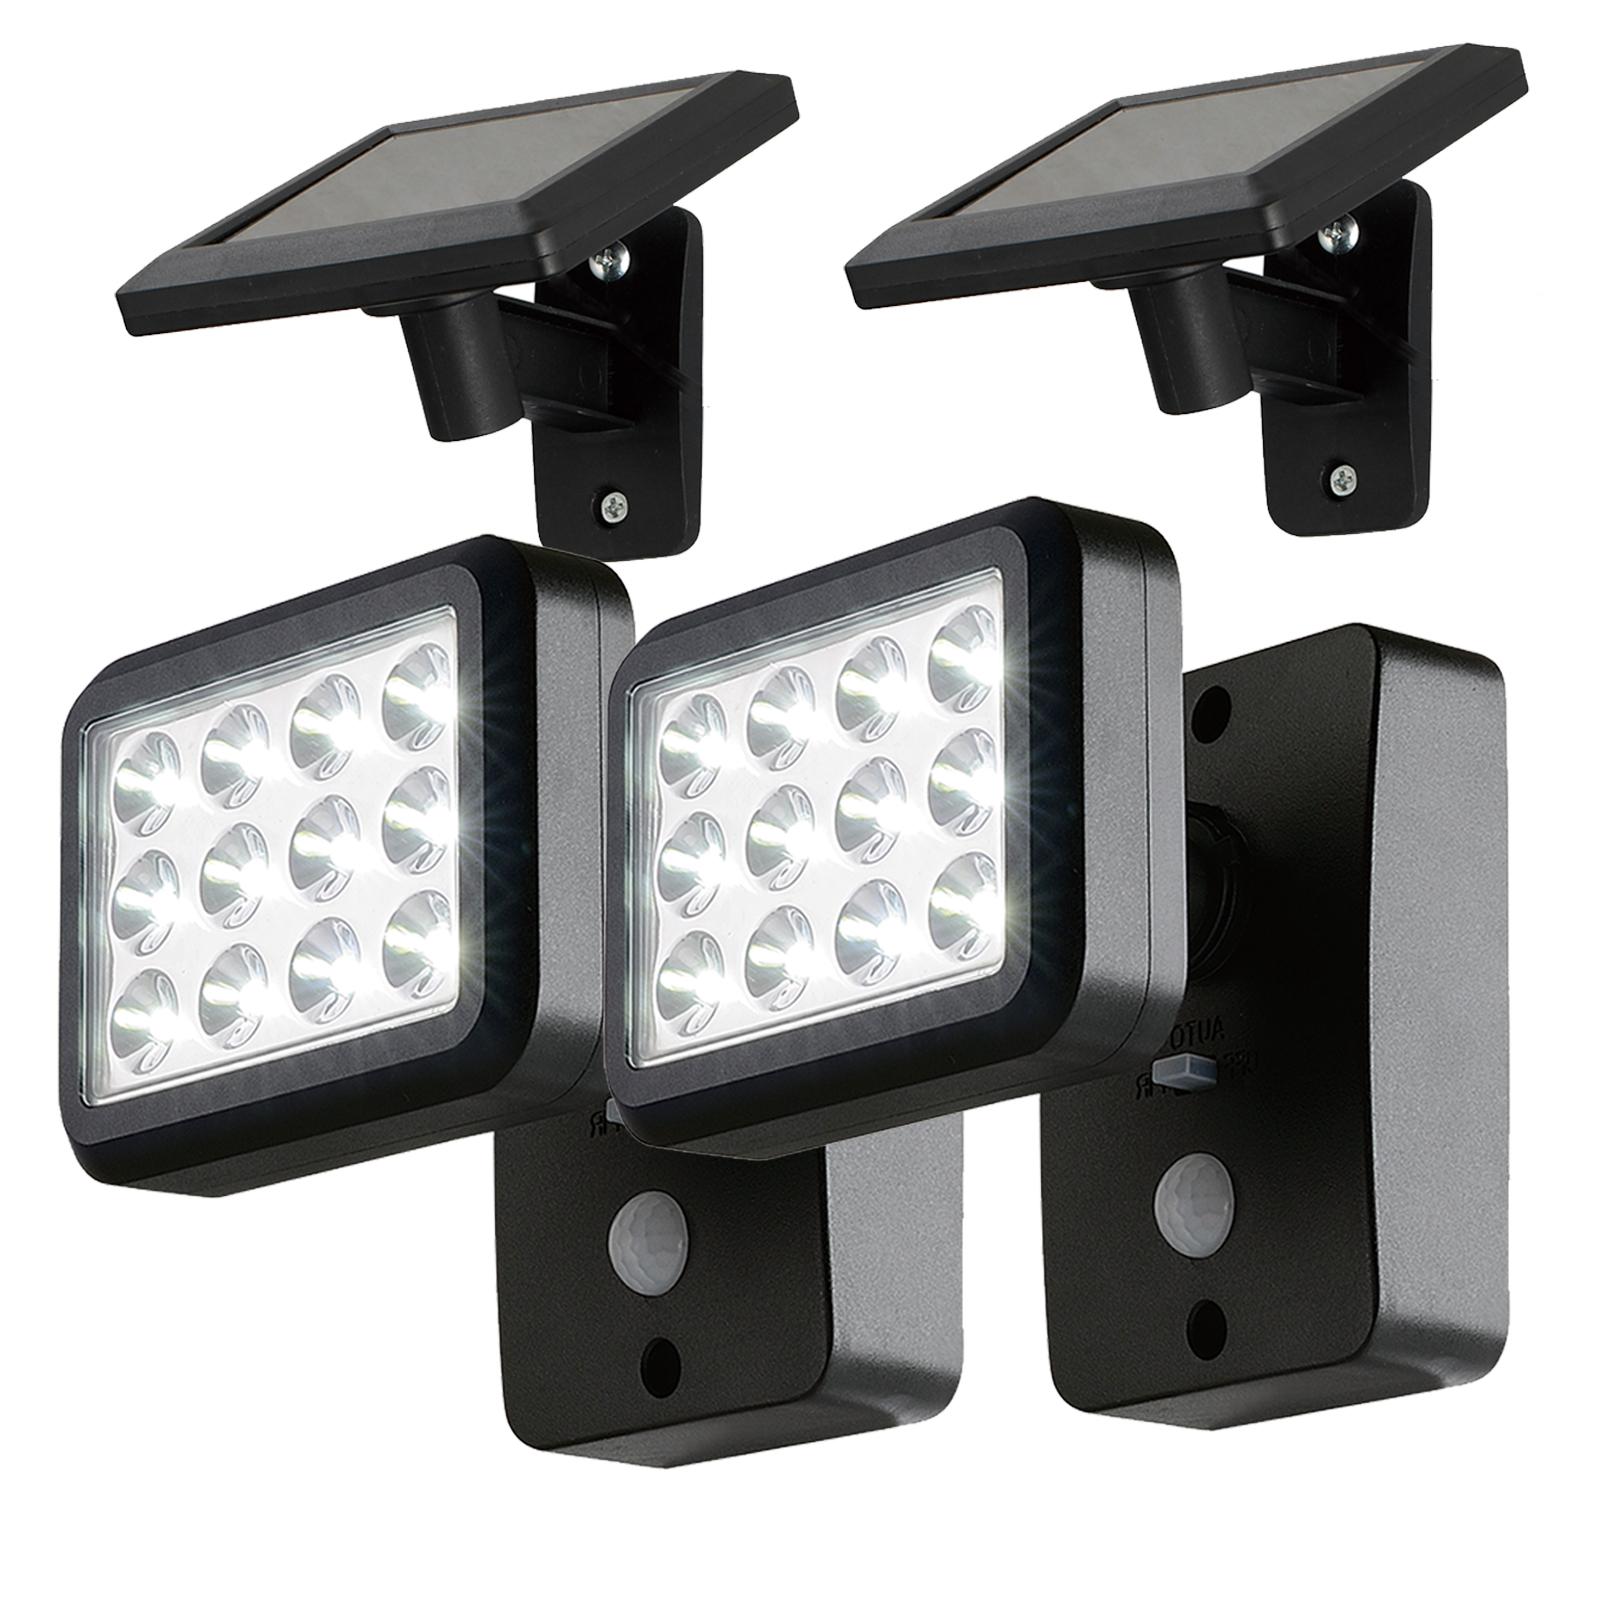 OUBO 2x LED Solar Leuchten Haus Garten Lampe Solarleuchte Solarlampe ...